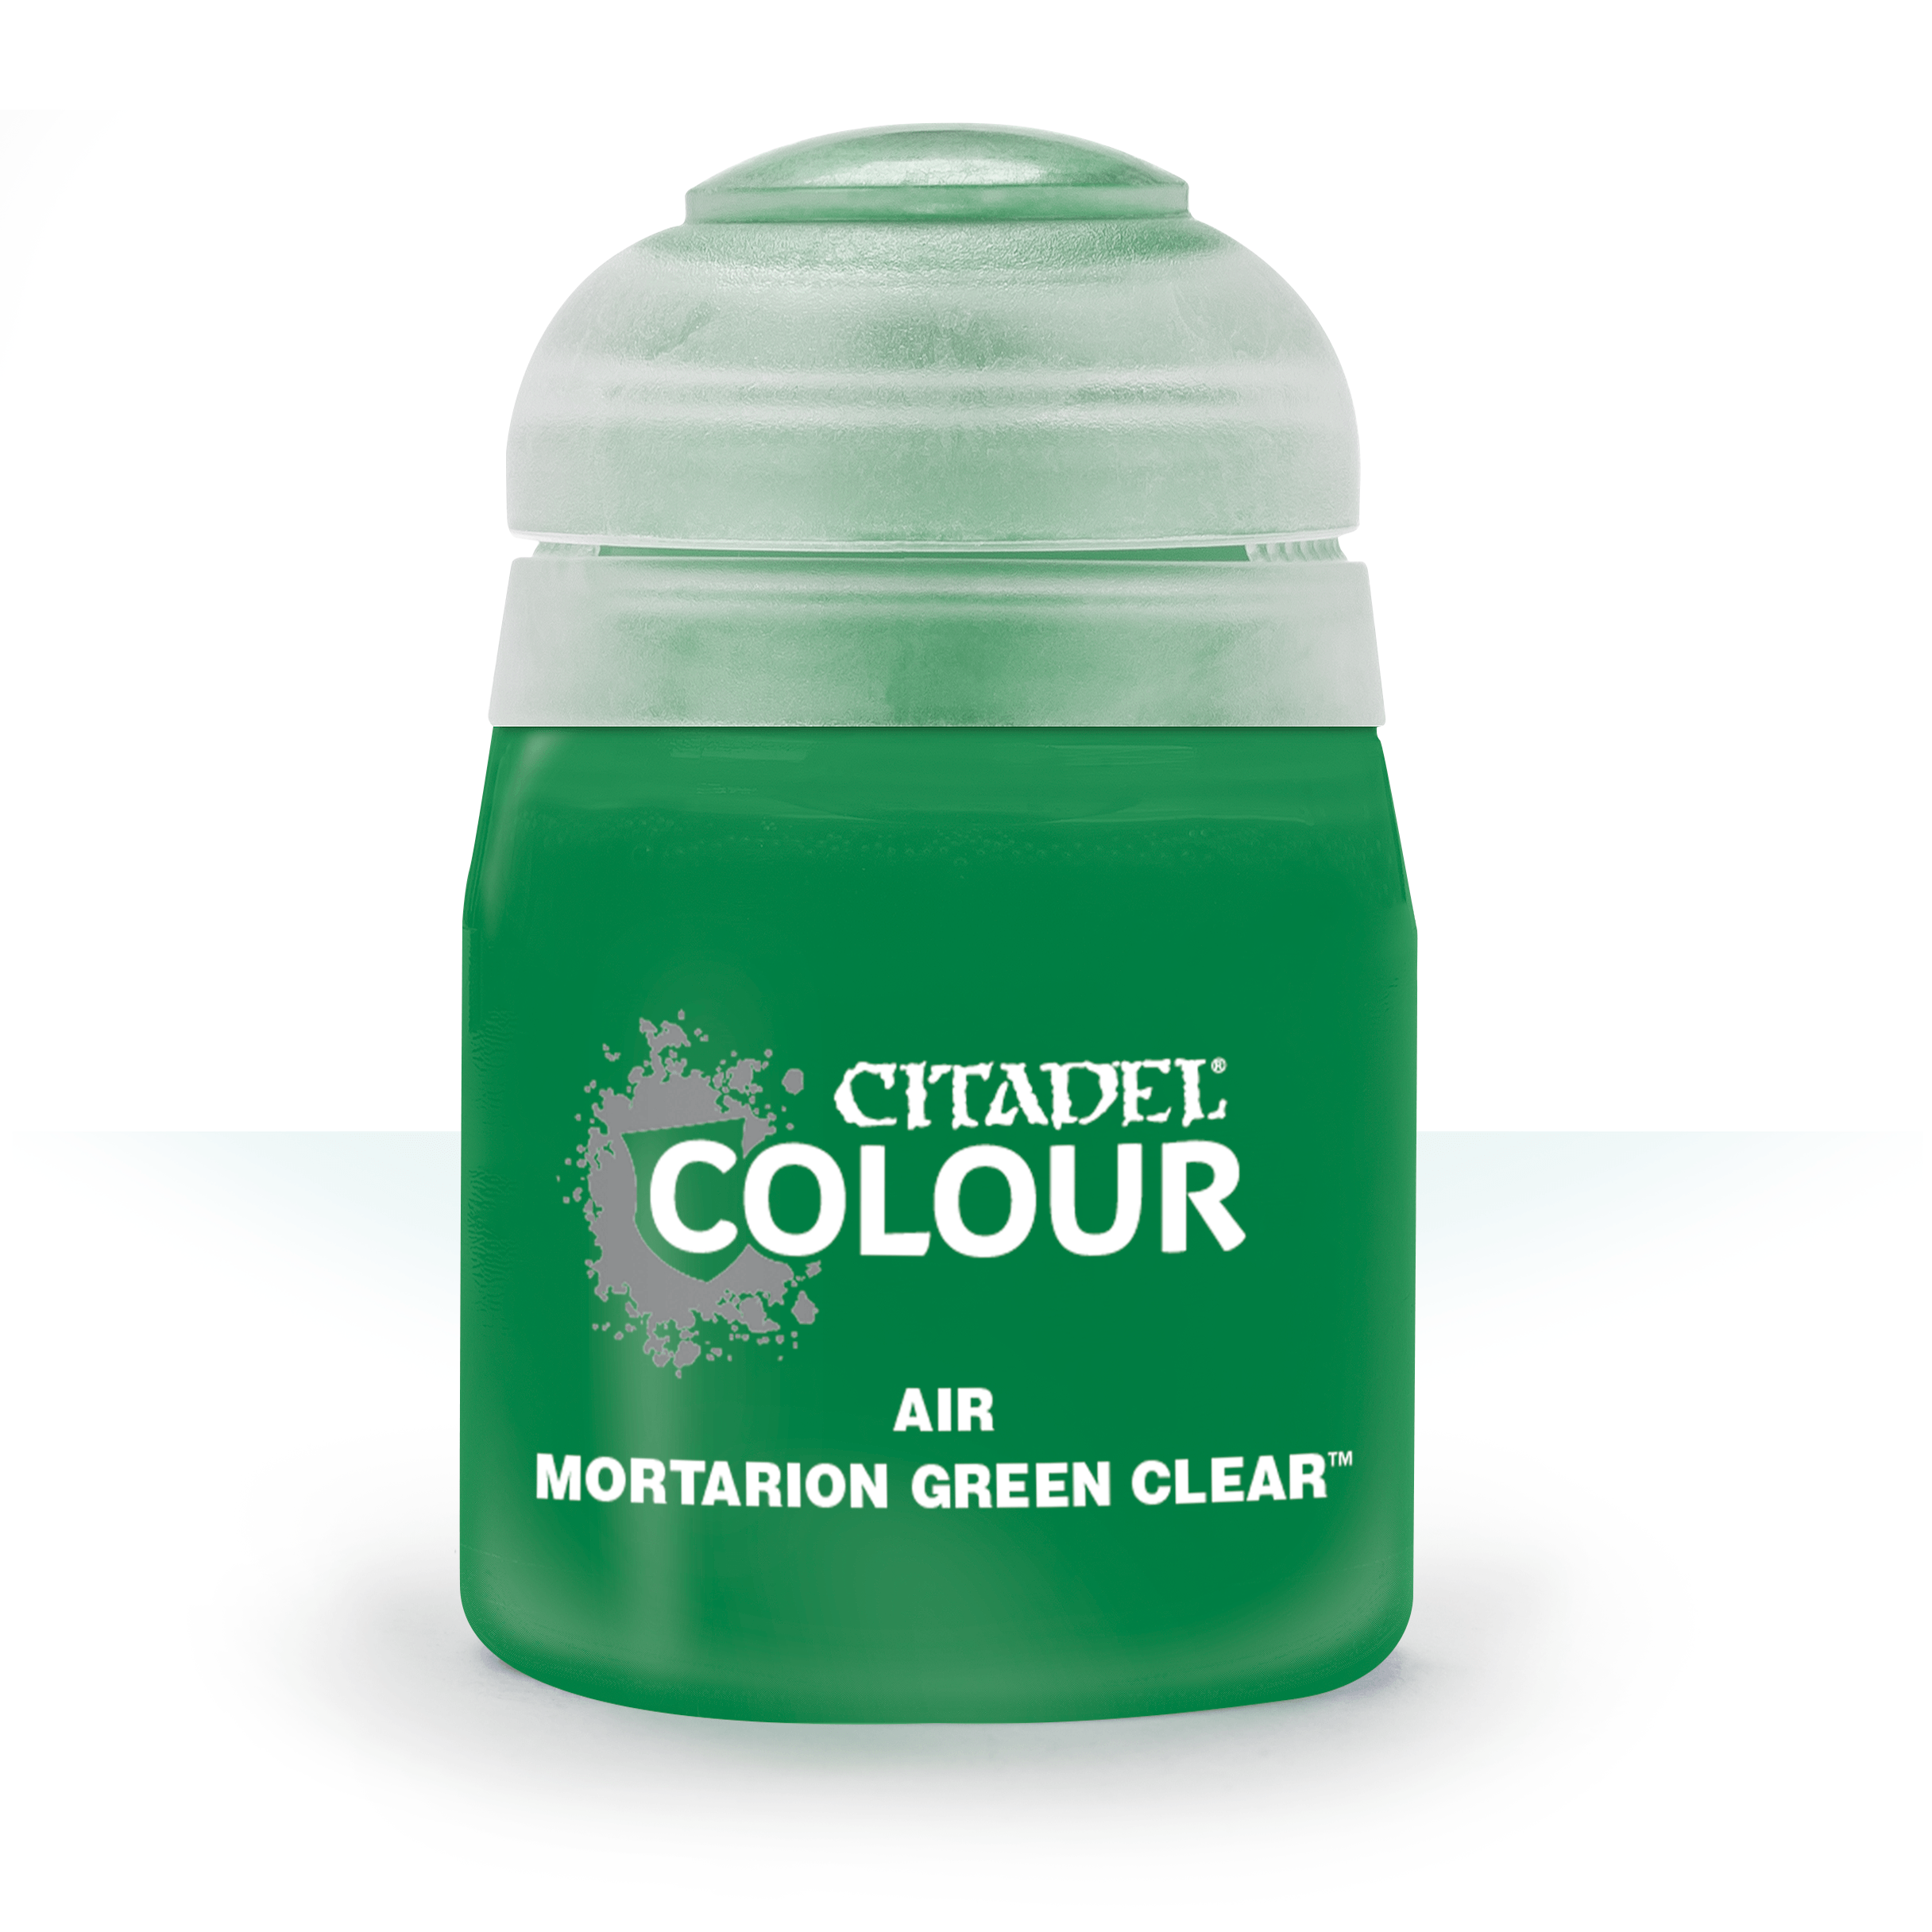 Mortarian Green Clear, Citadel Air 24ml